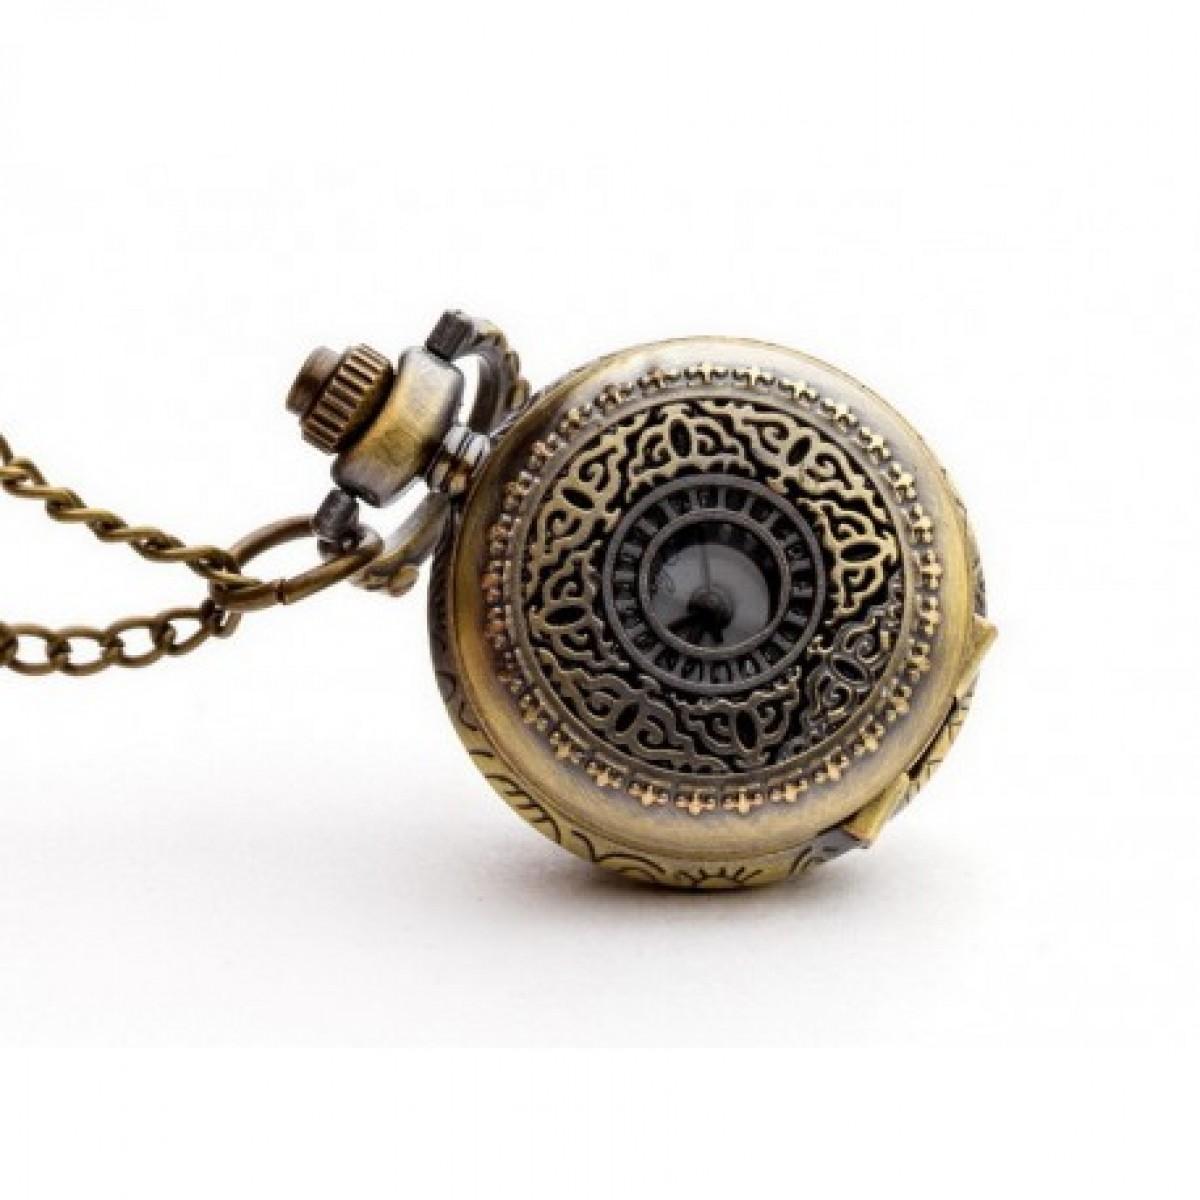 Hawuc I - zegarek wisiorek na łańcuszku